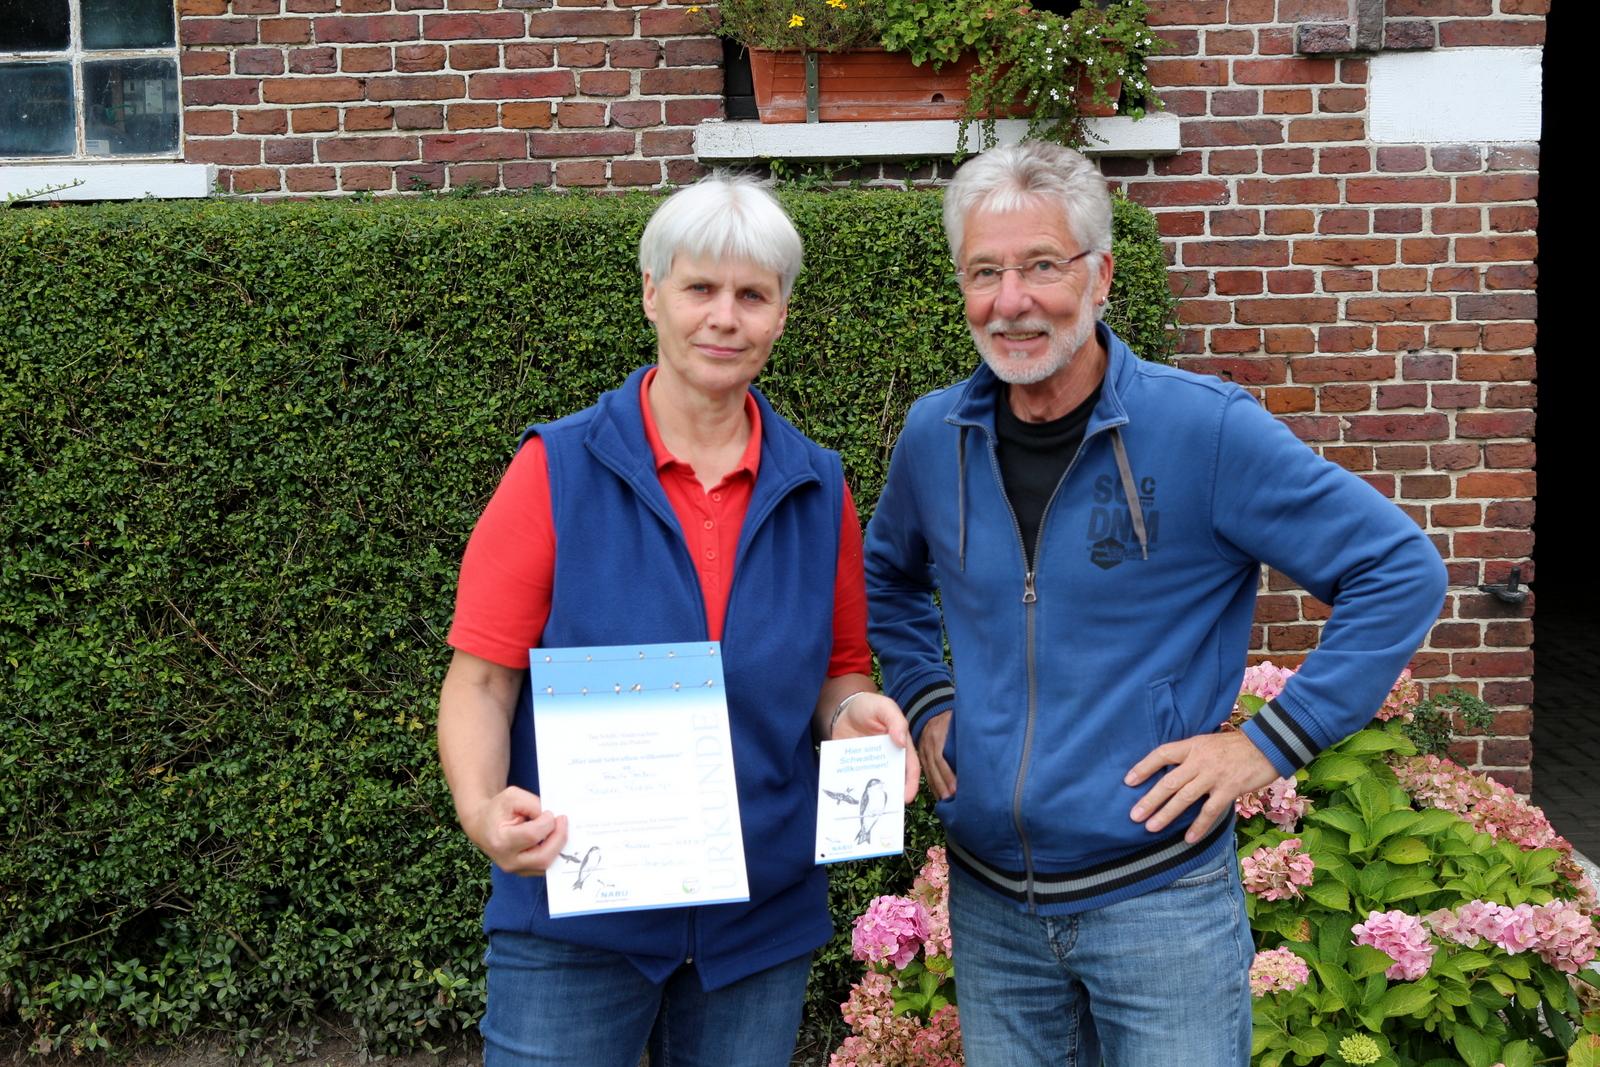 31.08.2017: Übergabe der Urkunde an Frau Janßen